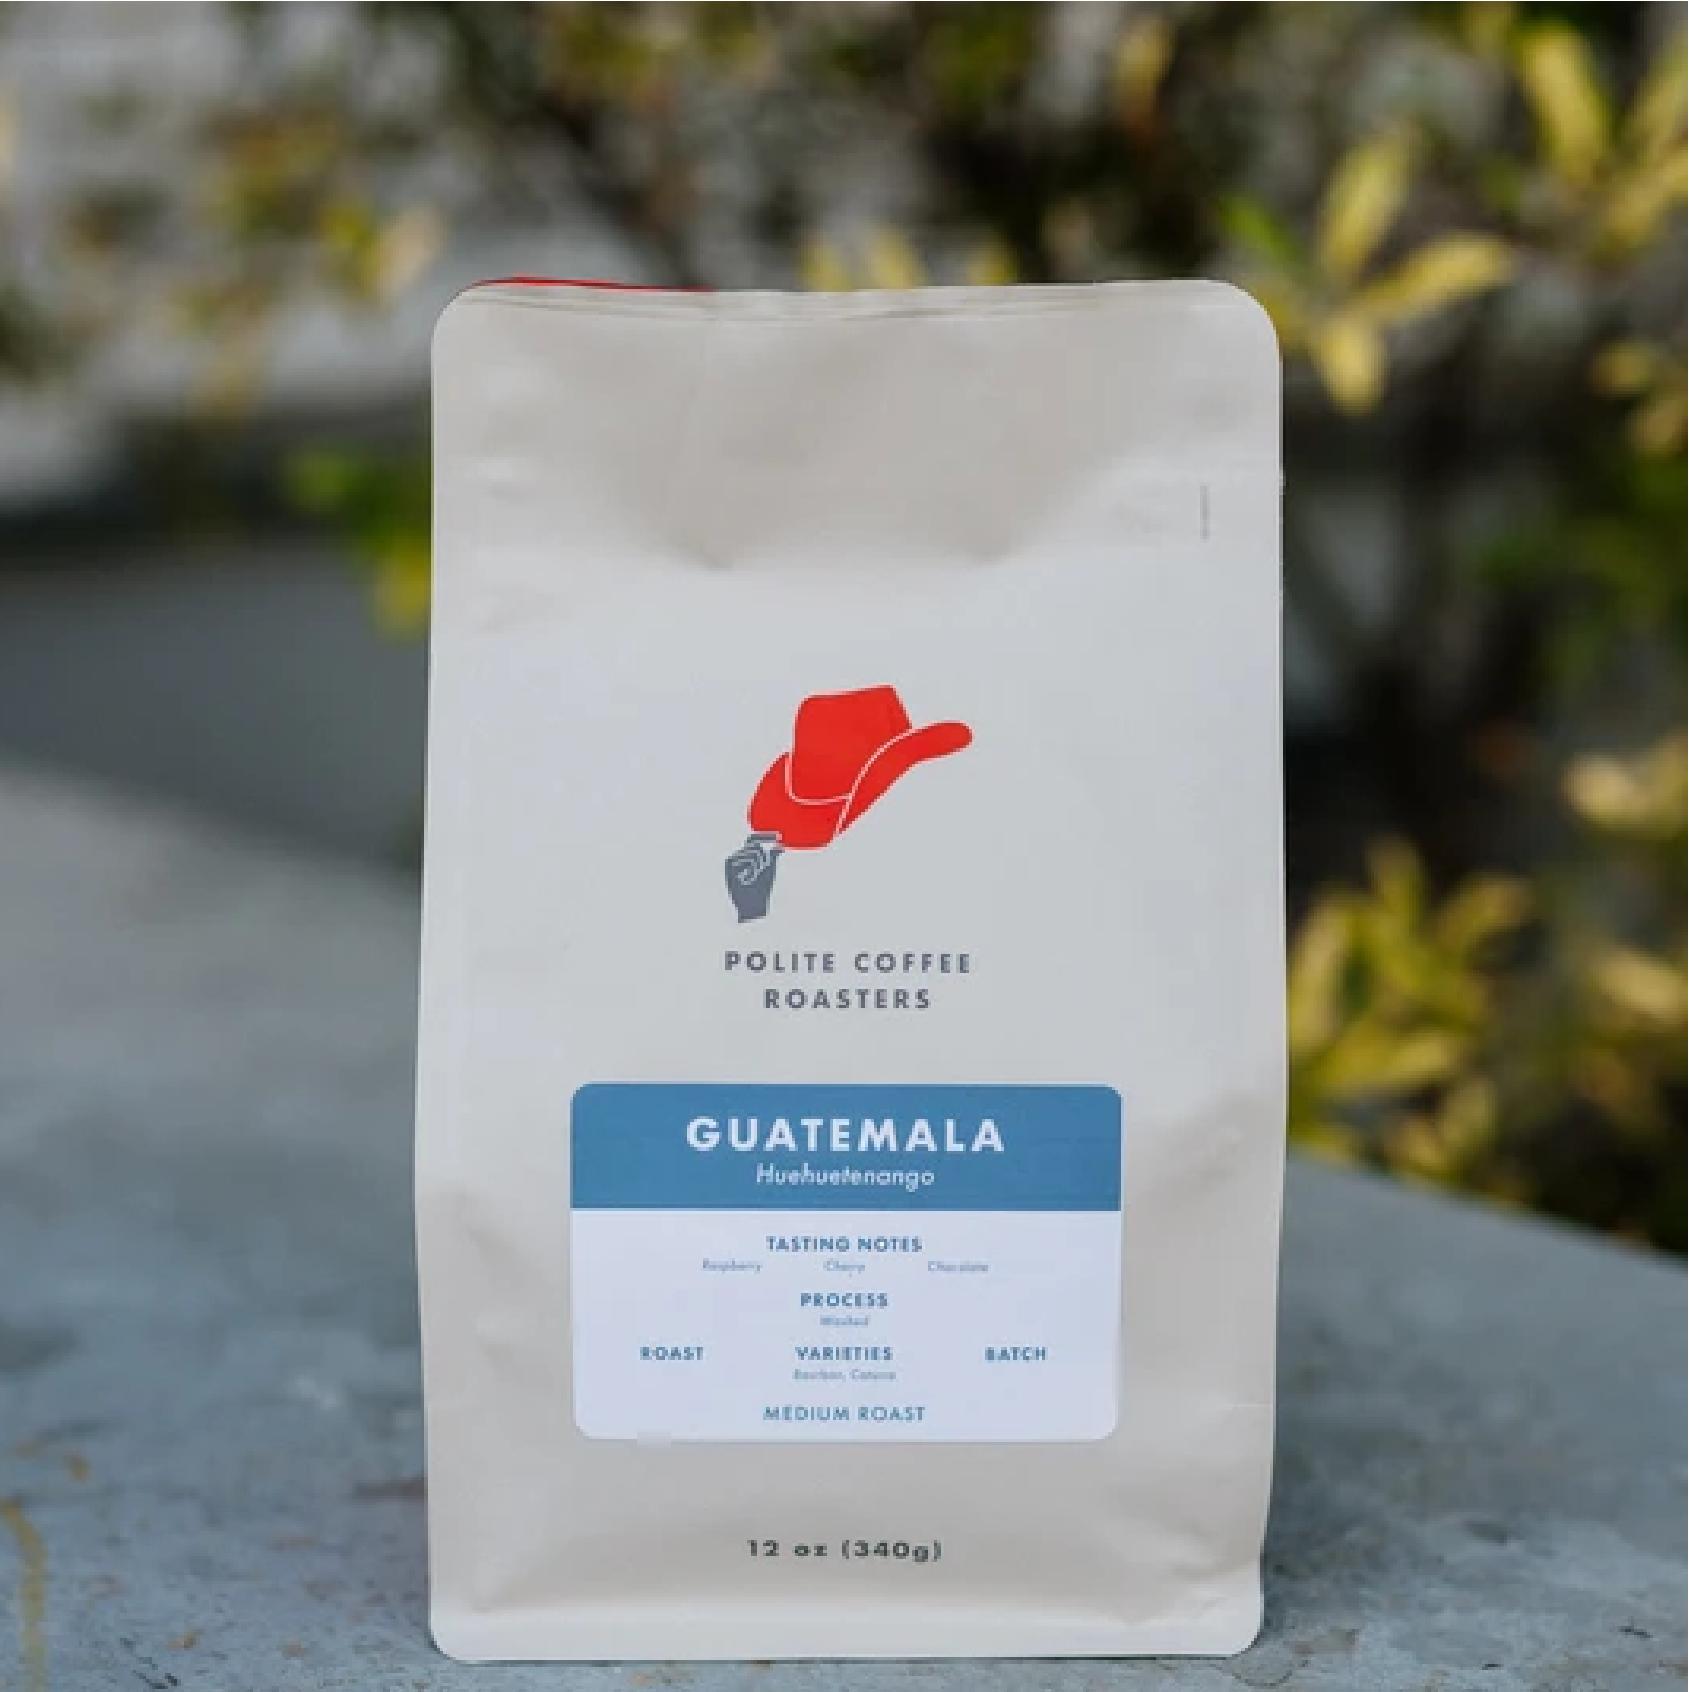 Guatemala Huehuetenango from Polite Coffee